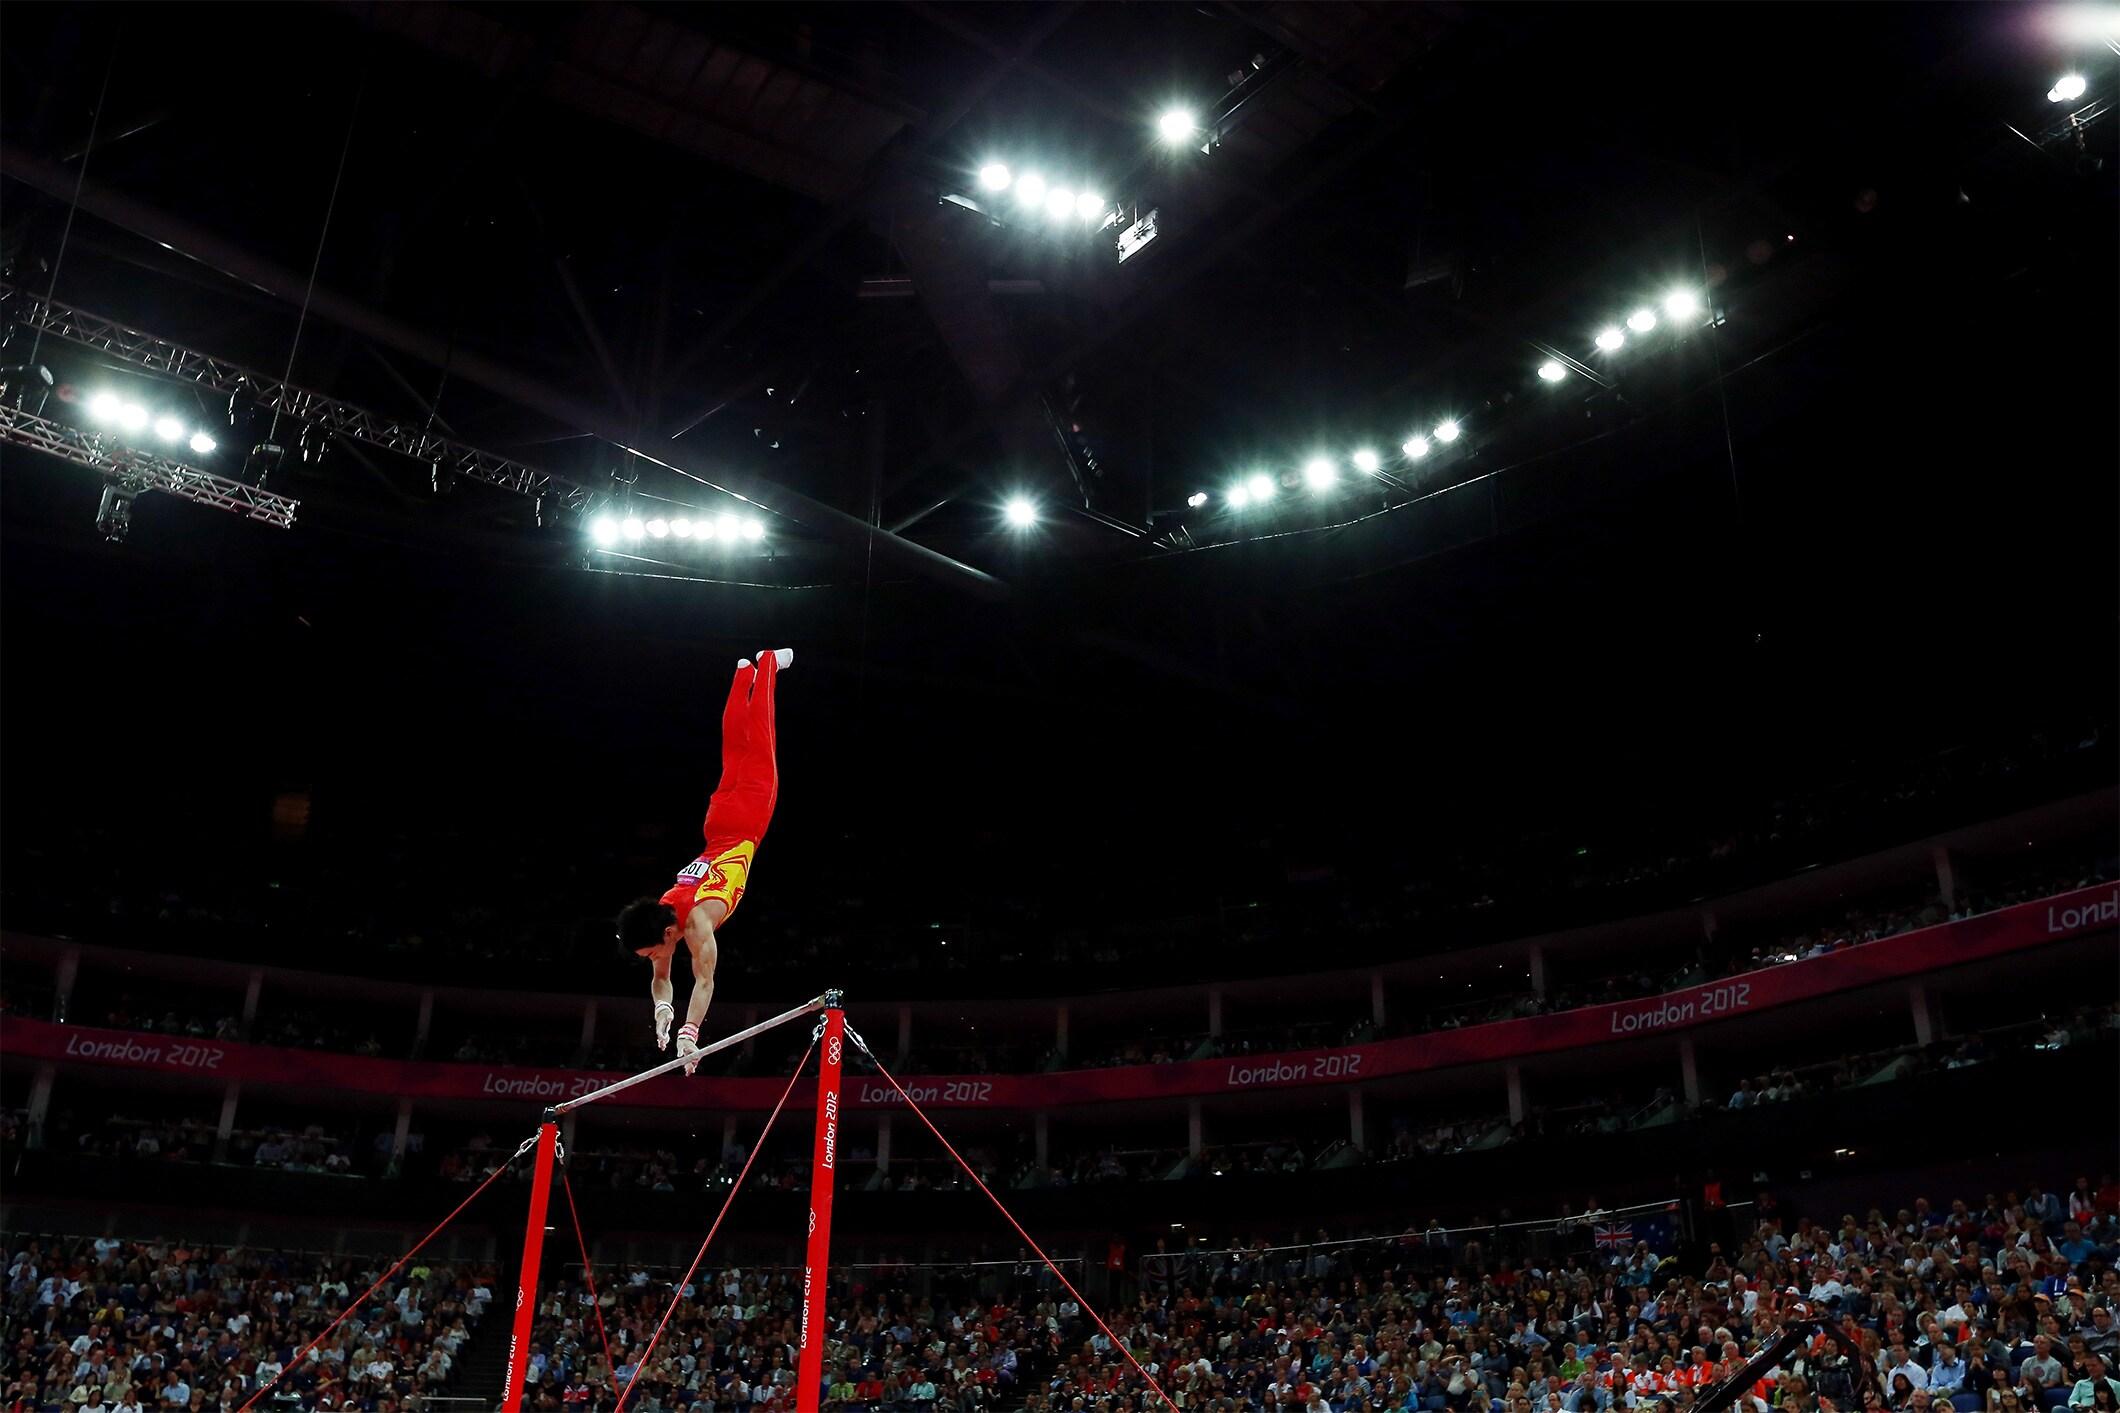 Gymnastics at London 2012